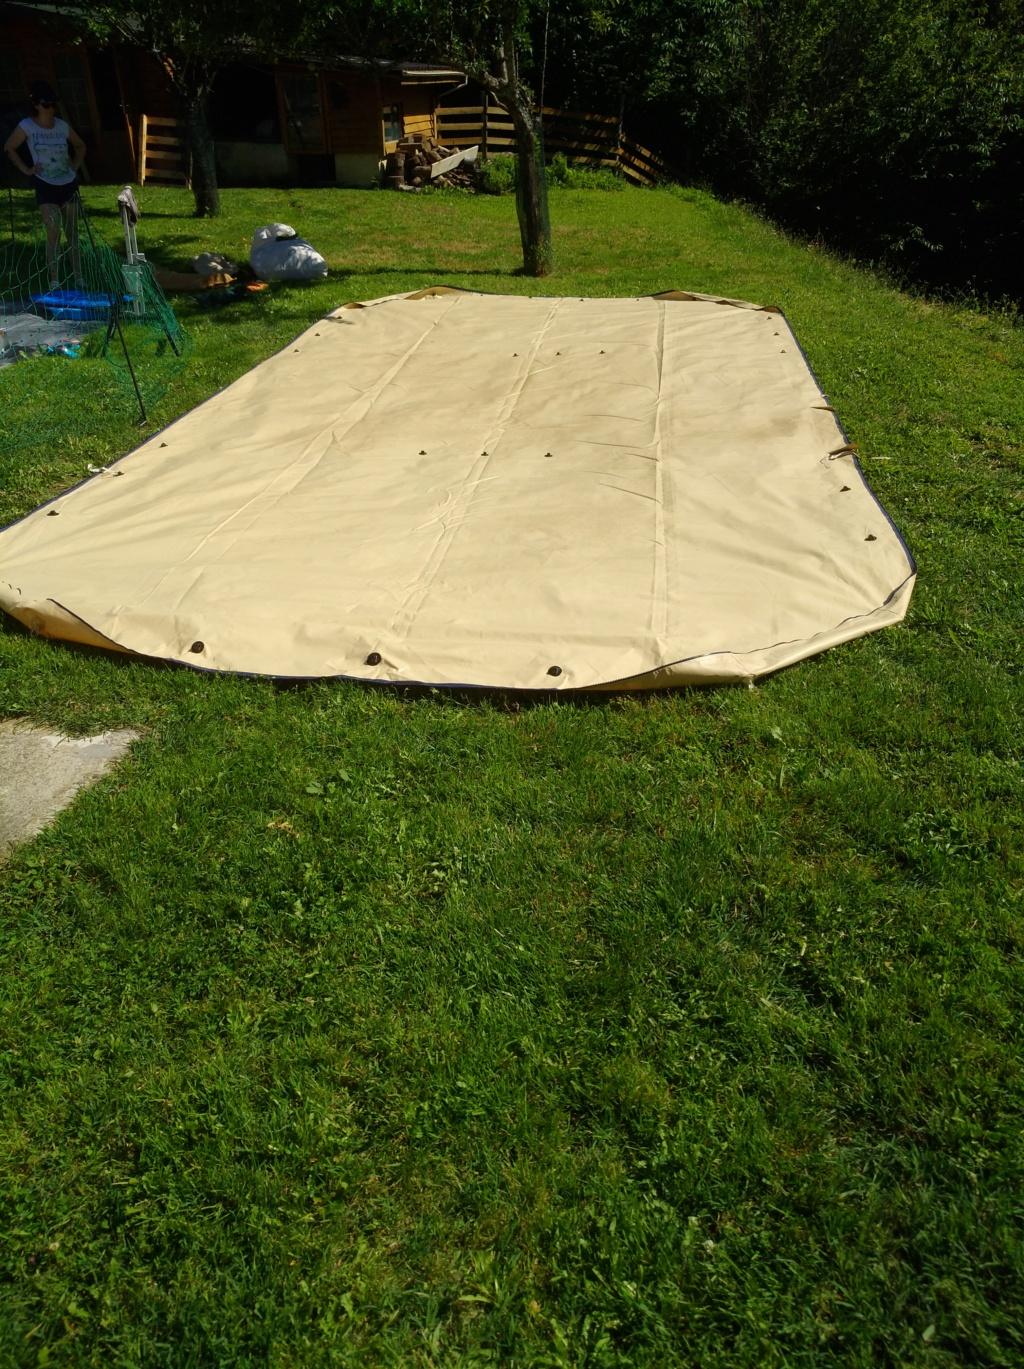 biscaya - tente cabanon biscaya vis-a-vis  Img_2037